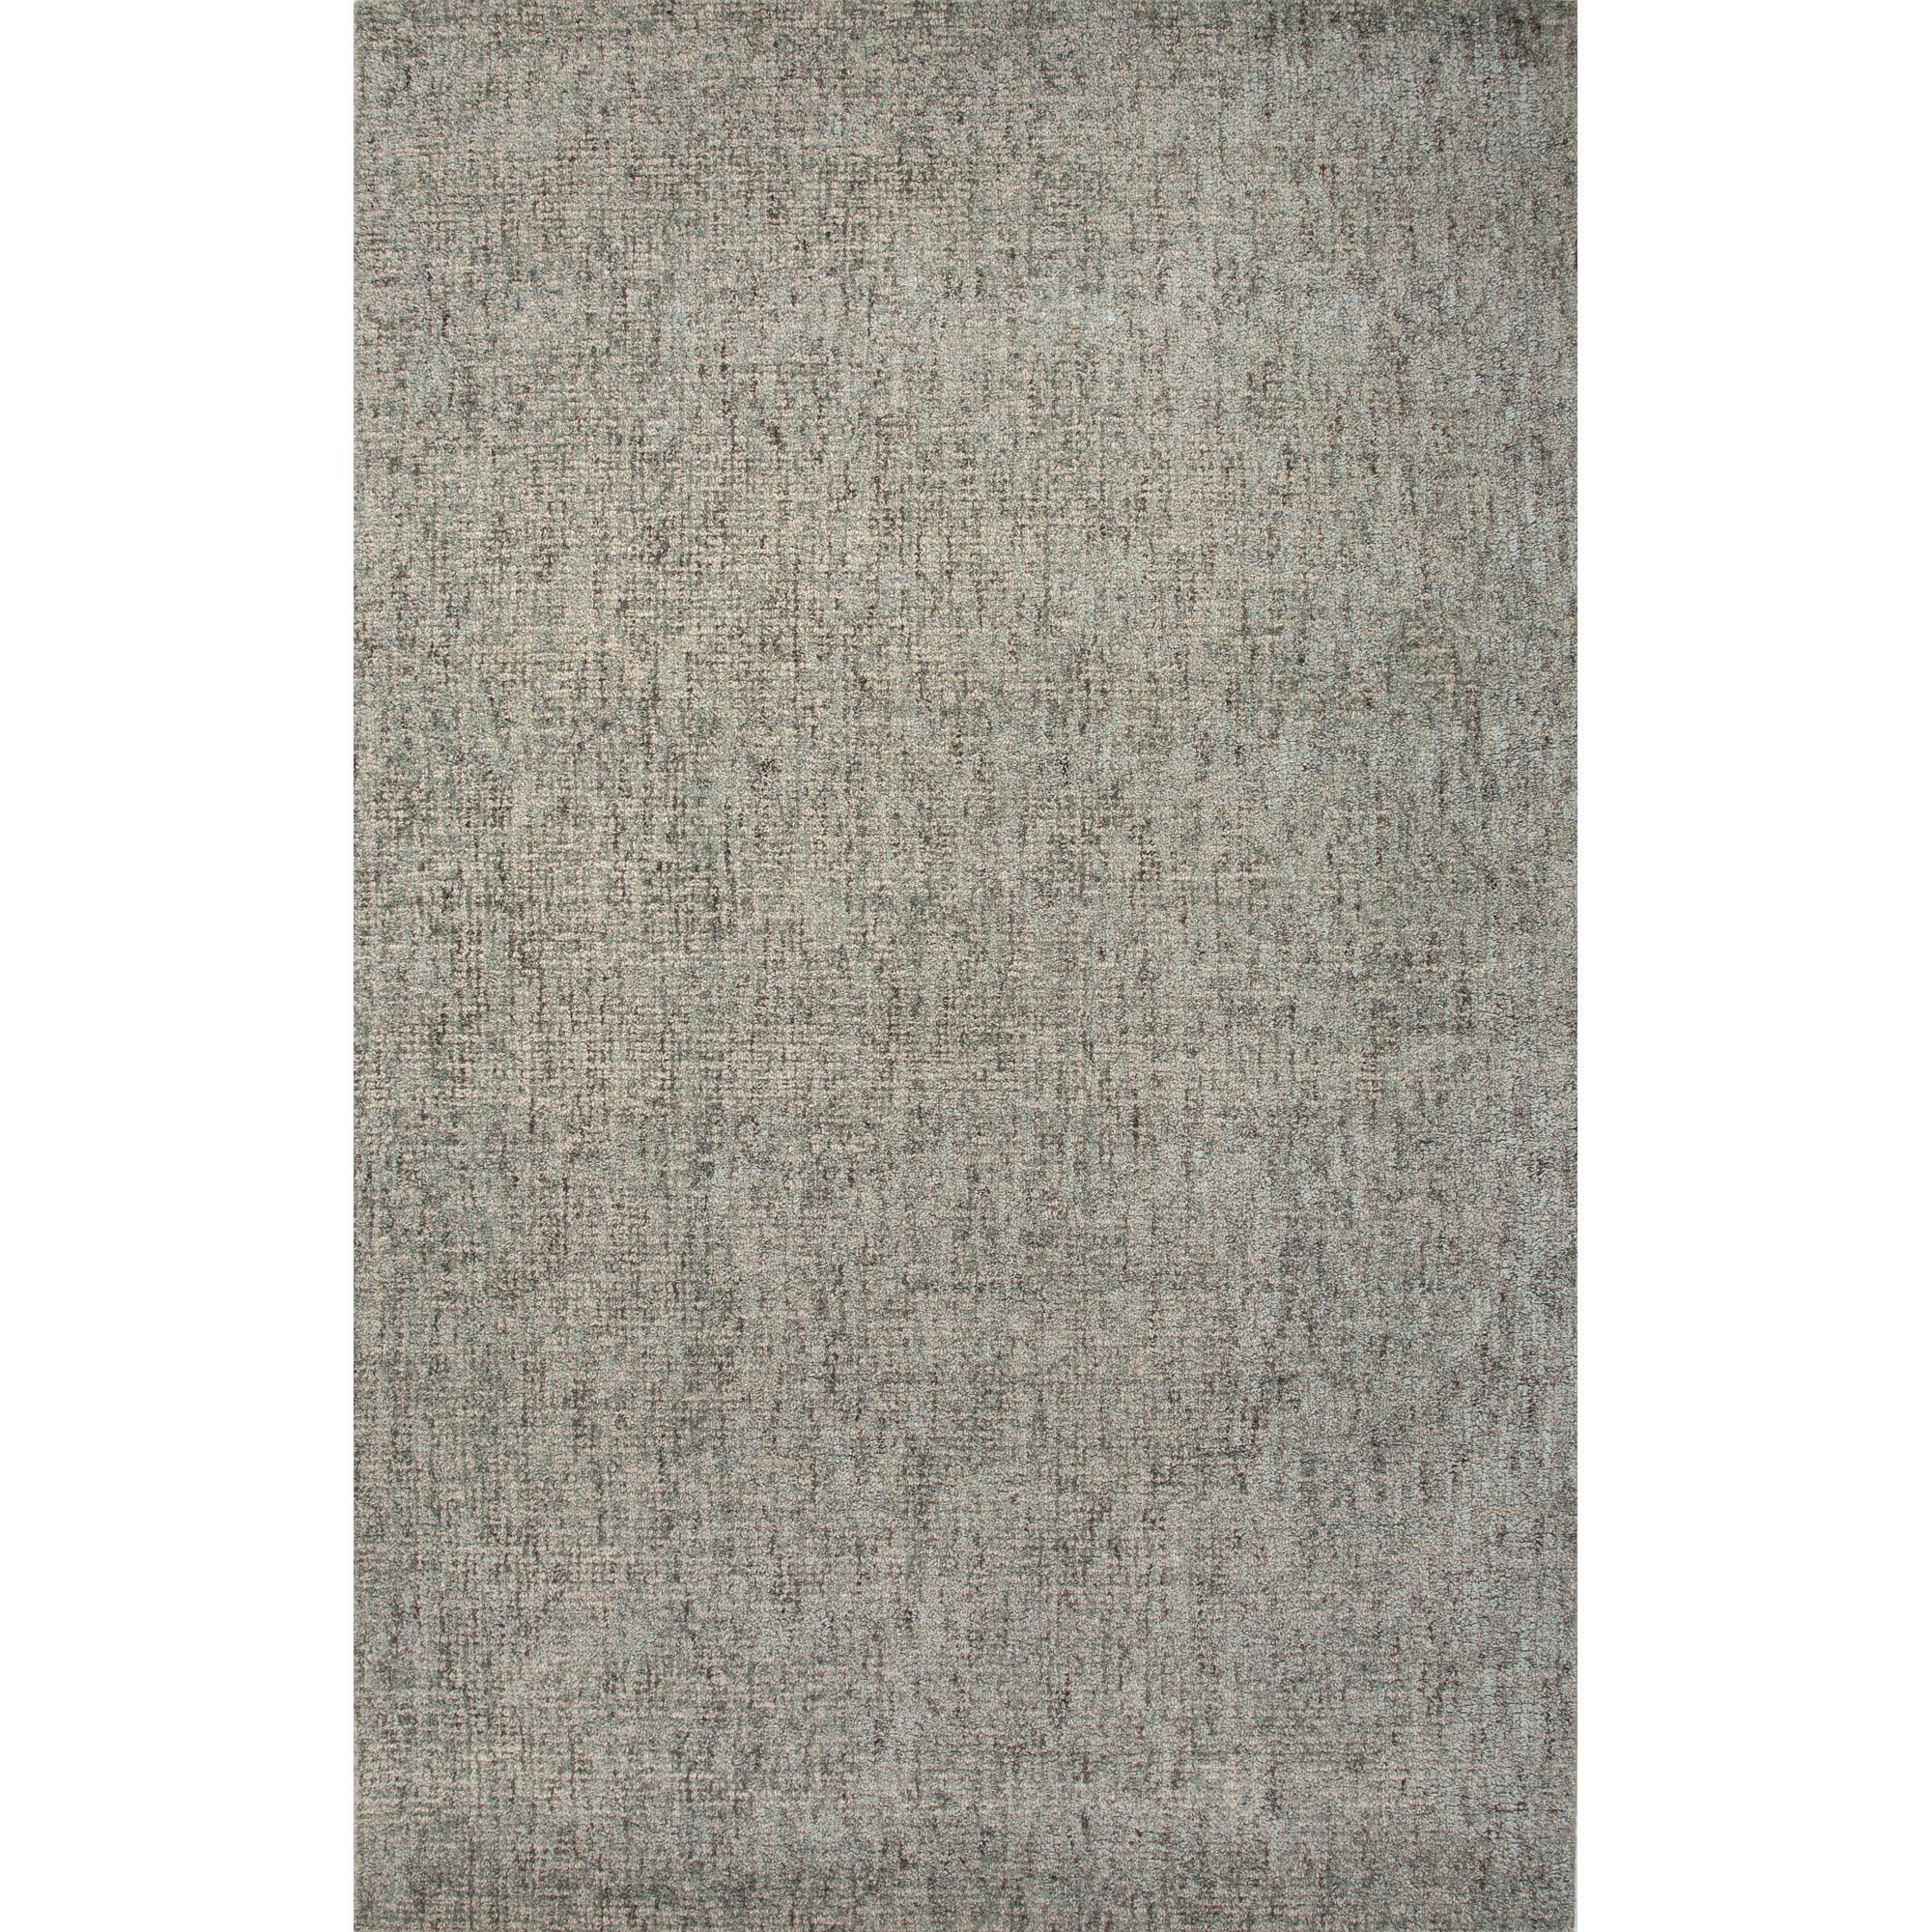 JAIPUR Rugs Britta Plus 8 x 10 Rug - Item Number: RUG119333